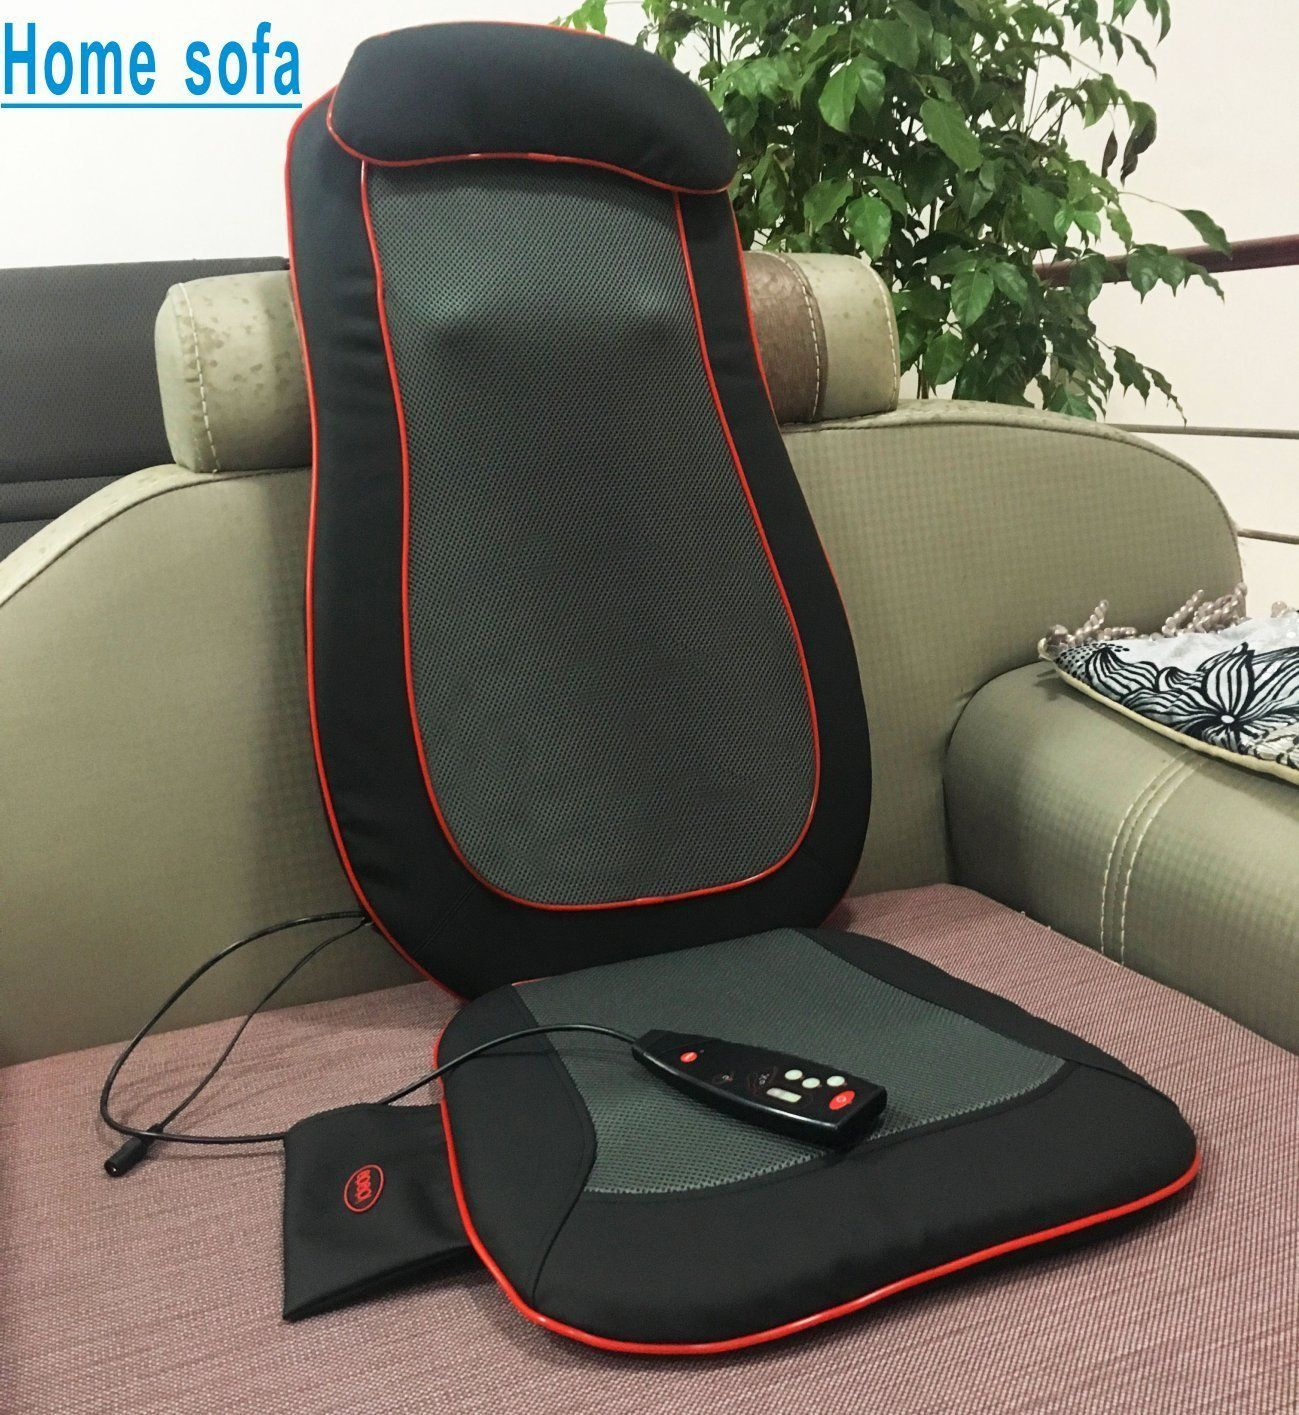 shiatsu massage chair pad sale